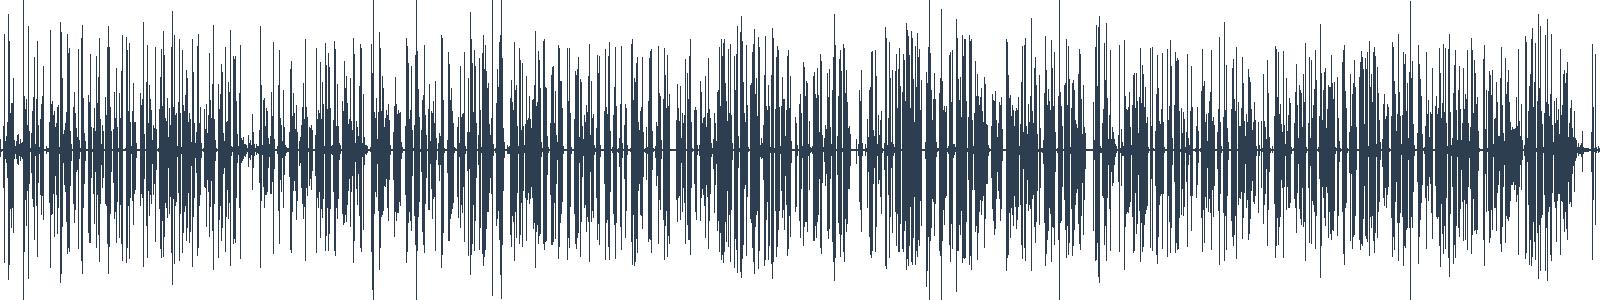 1. pôstna nedeľa waveform